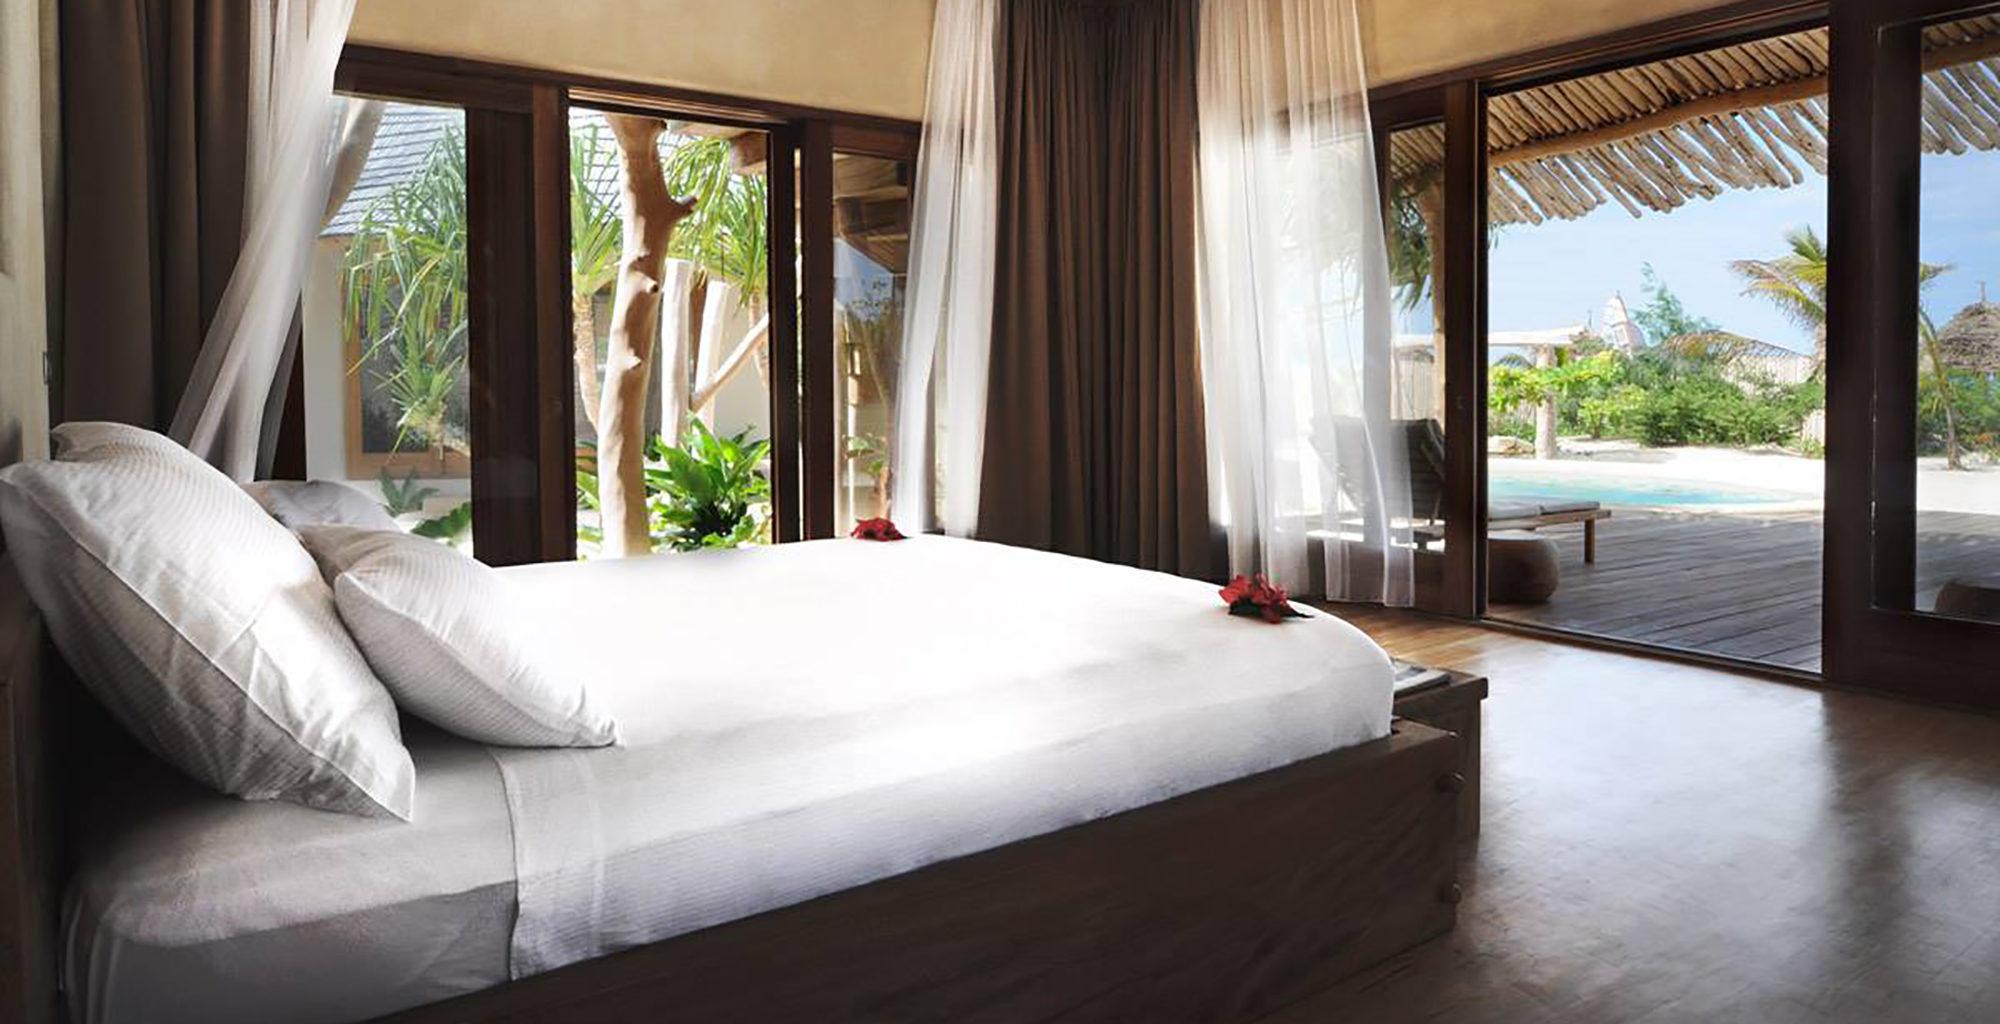 Tanzania-White-Sand-Villas-Bedroom